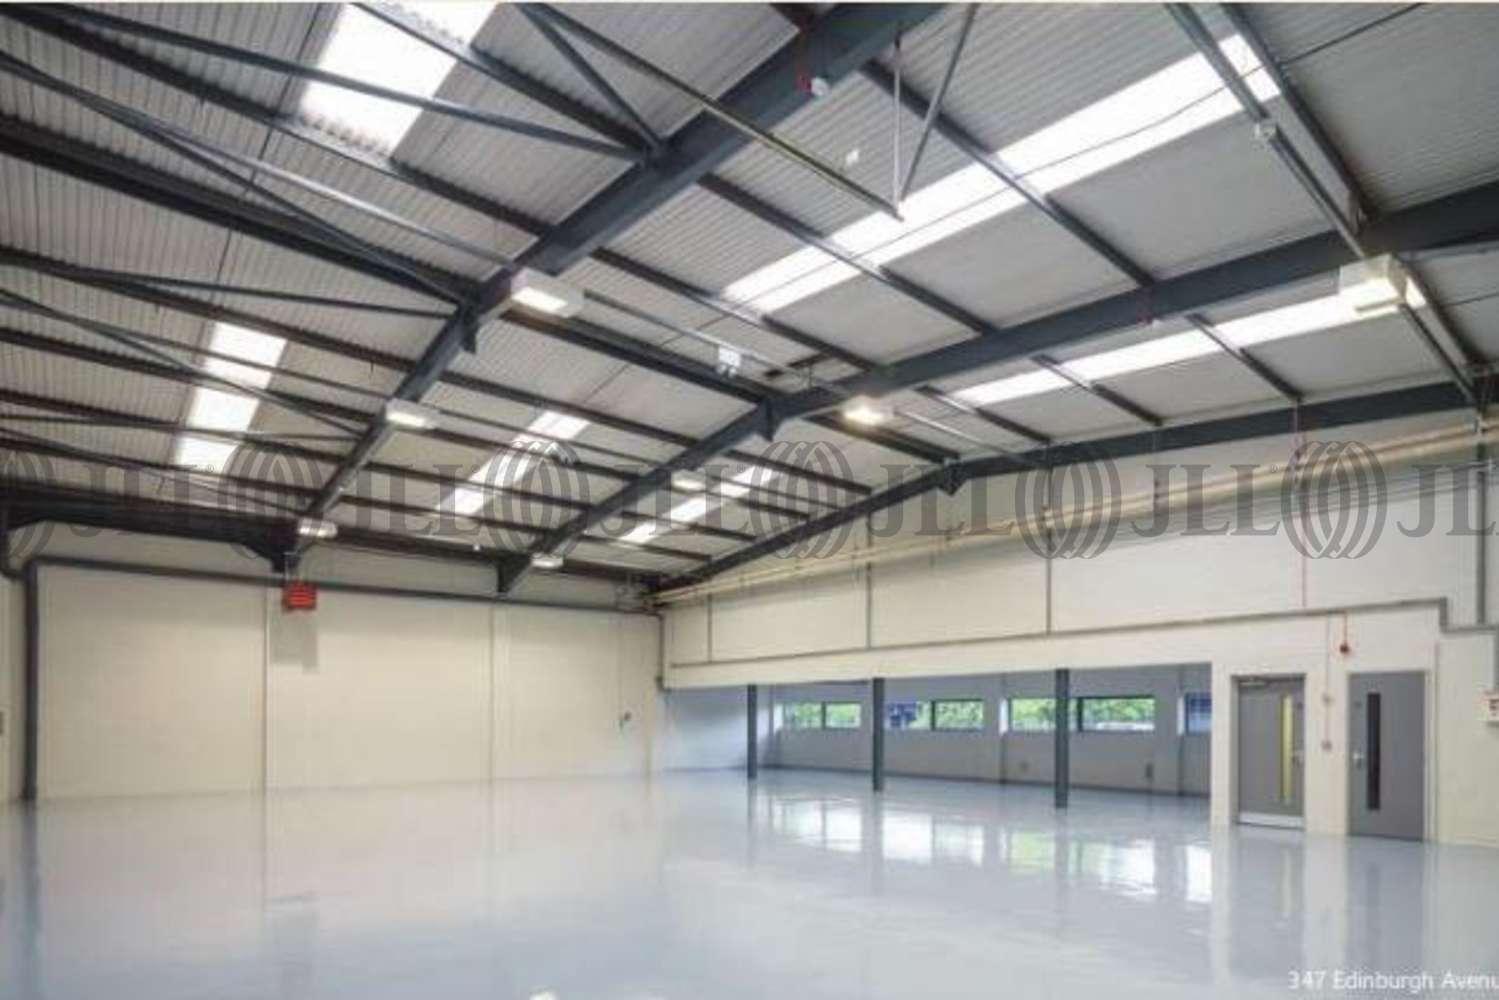 Industrial Slough, SL1 4TU - Edinburgh Avenue Trade Park - 2